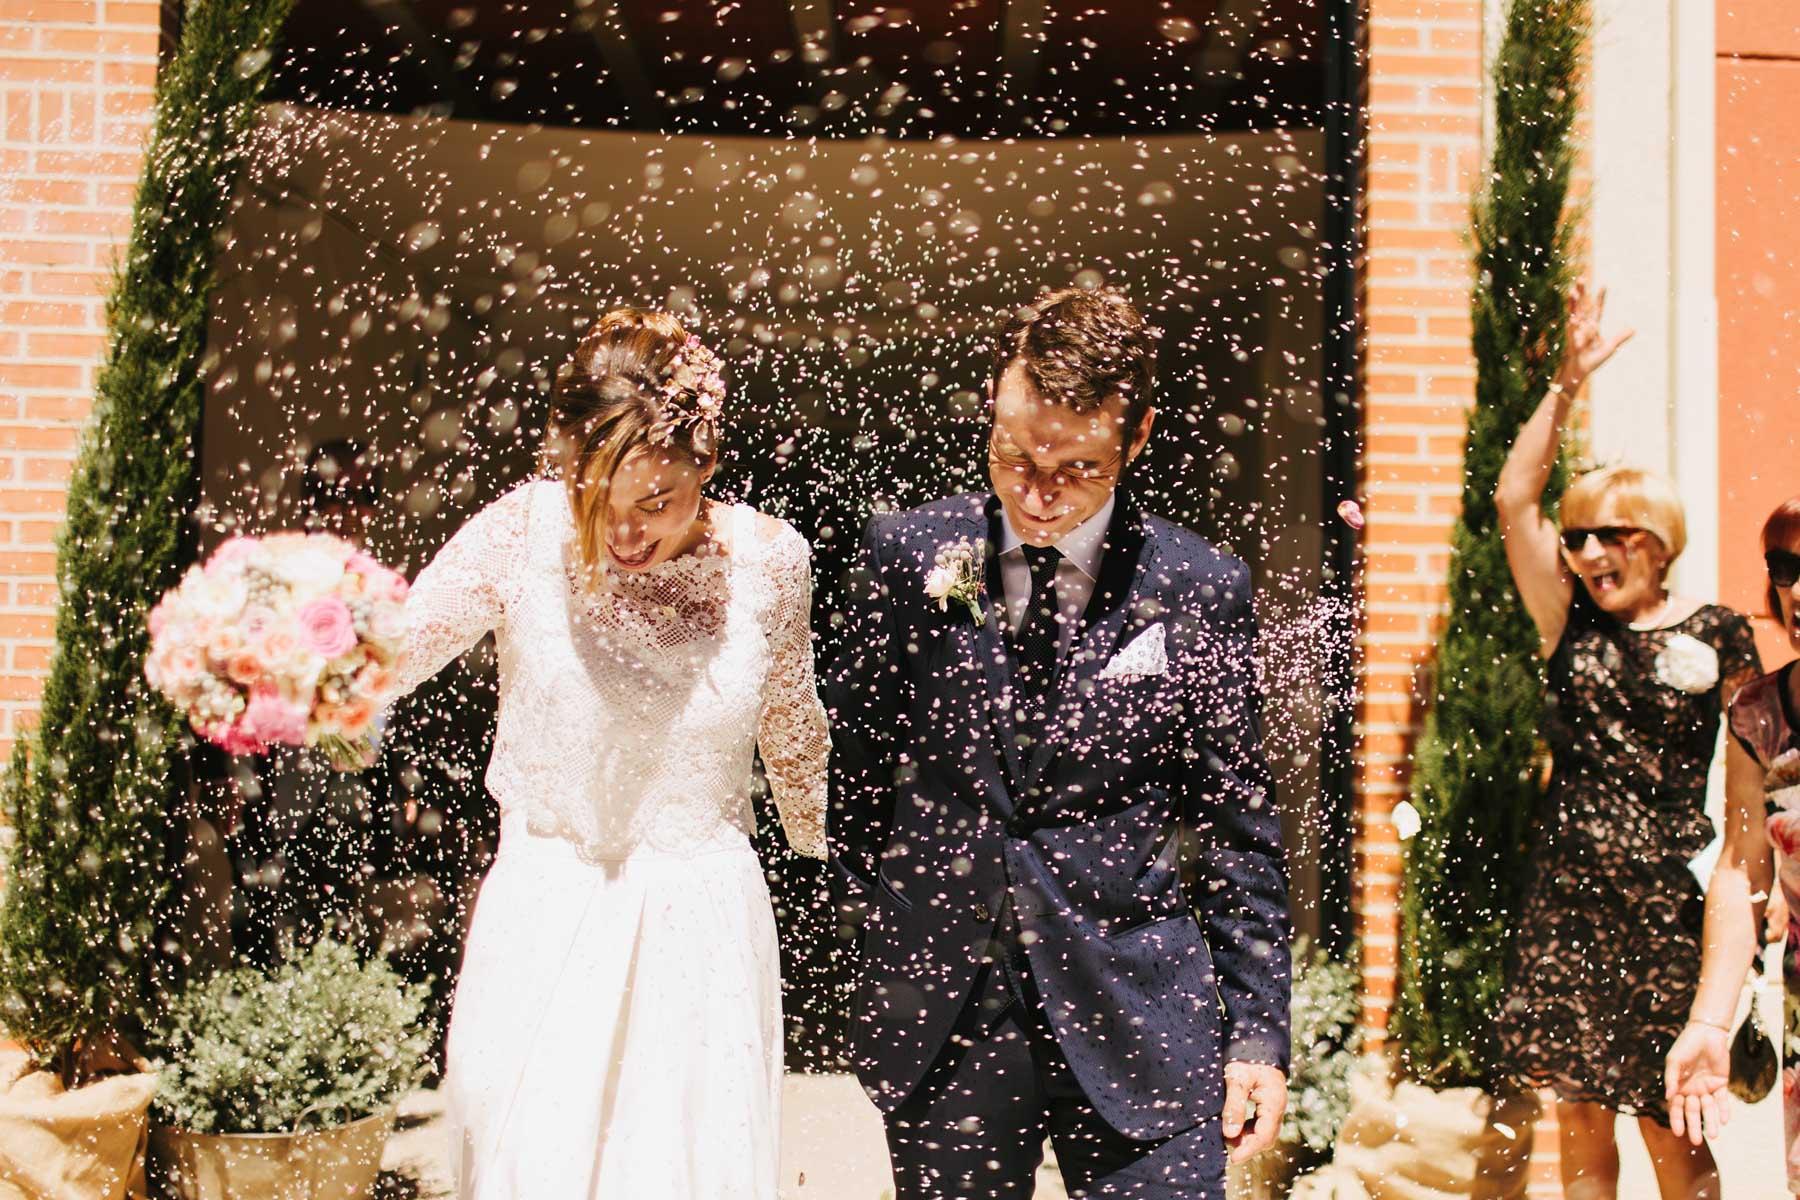 fotografo de bodas Jairo Crena-265